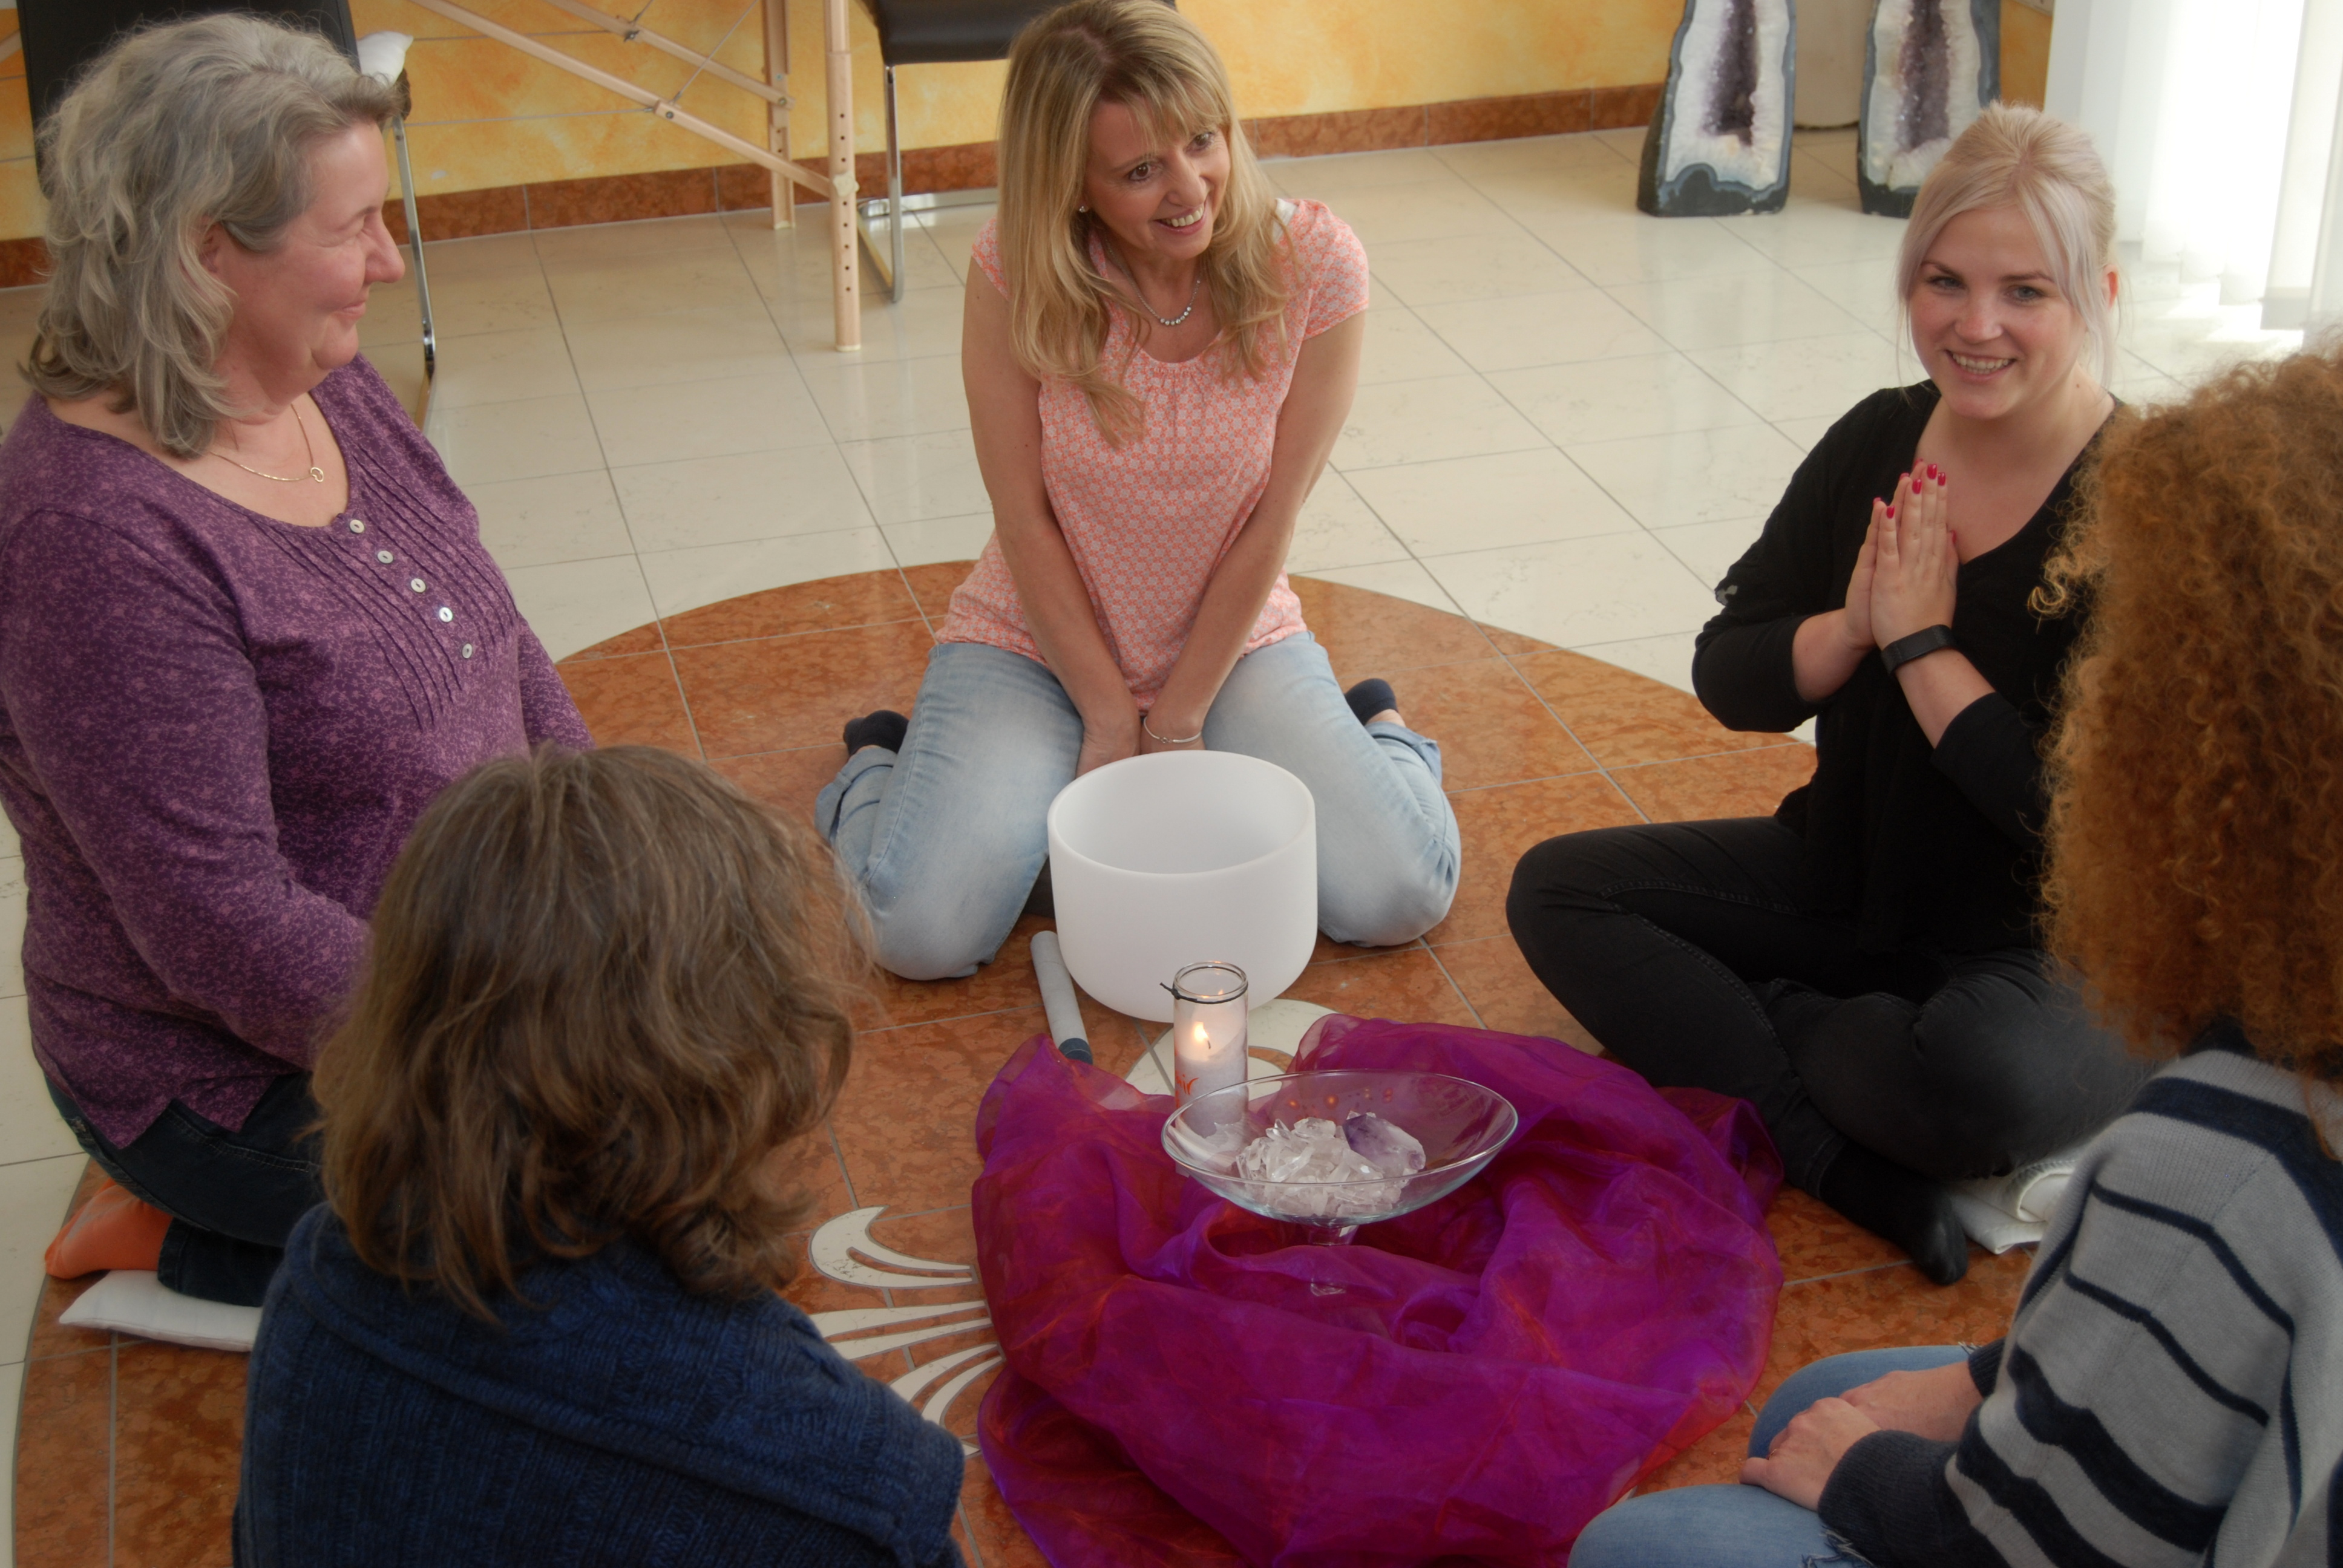 Meditation - Channeling